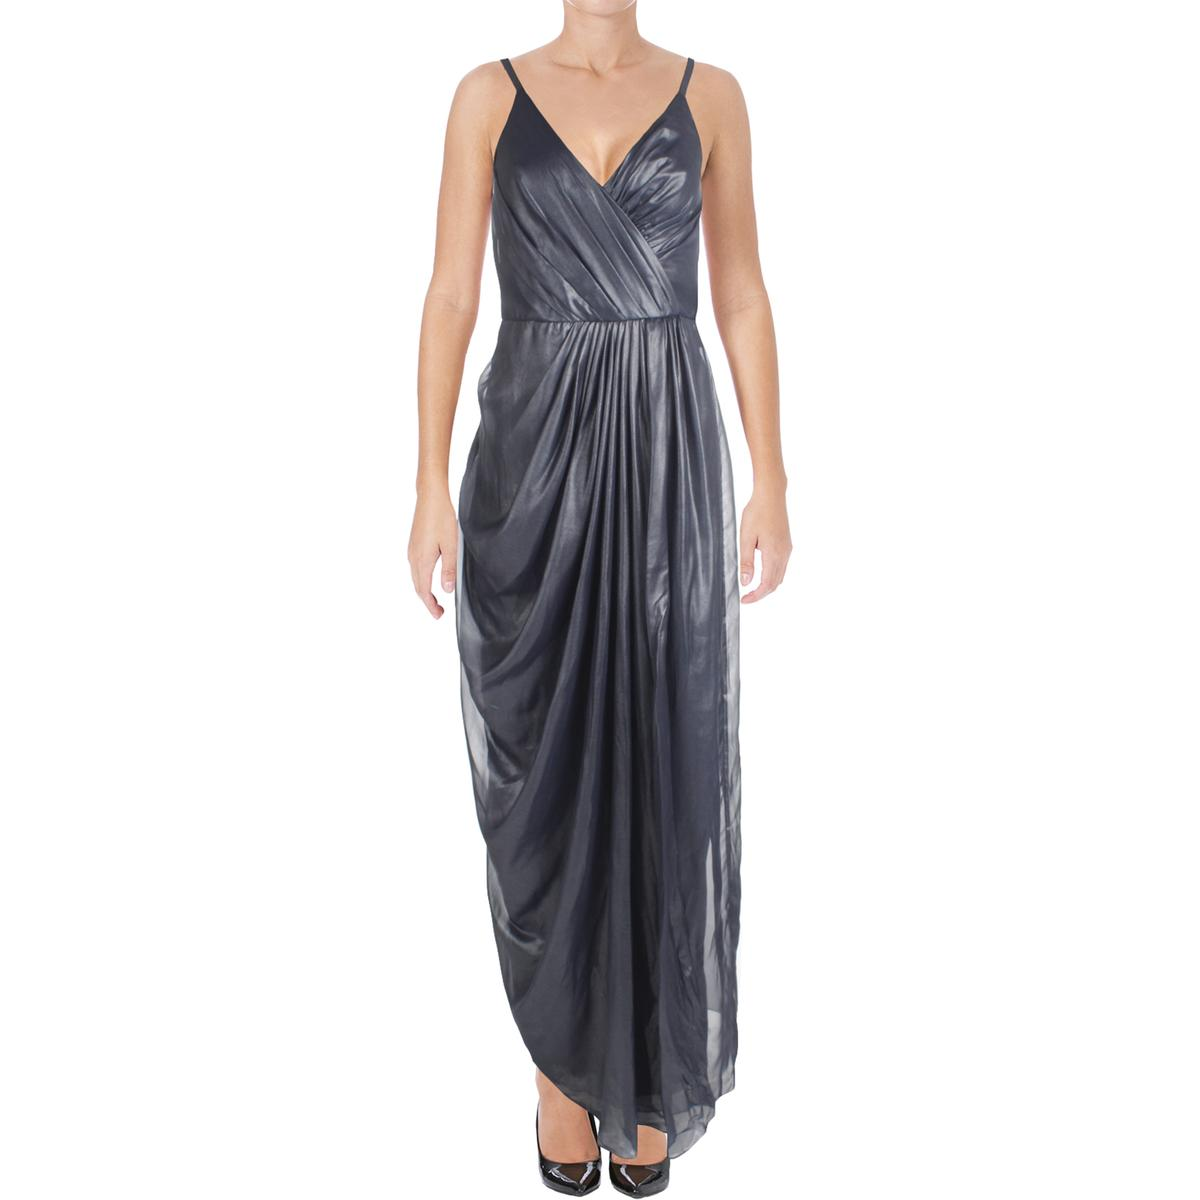 Vera Wang Womens Chiffon Shimmer Sleeveless Evening Dress Gown BHFO ...